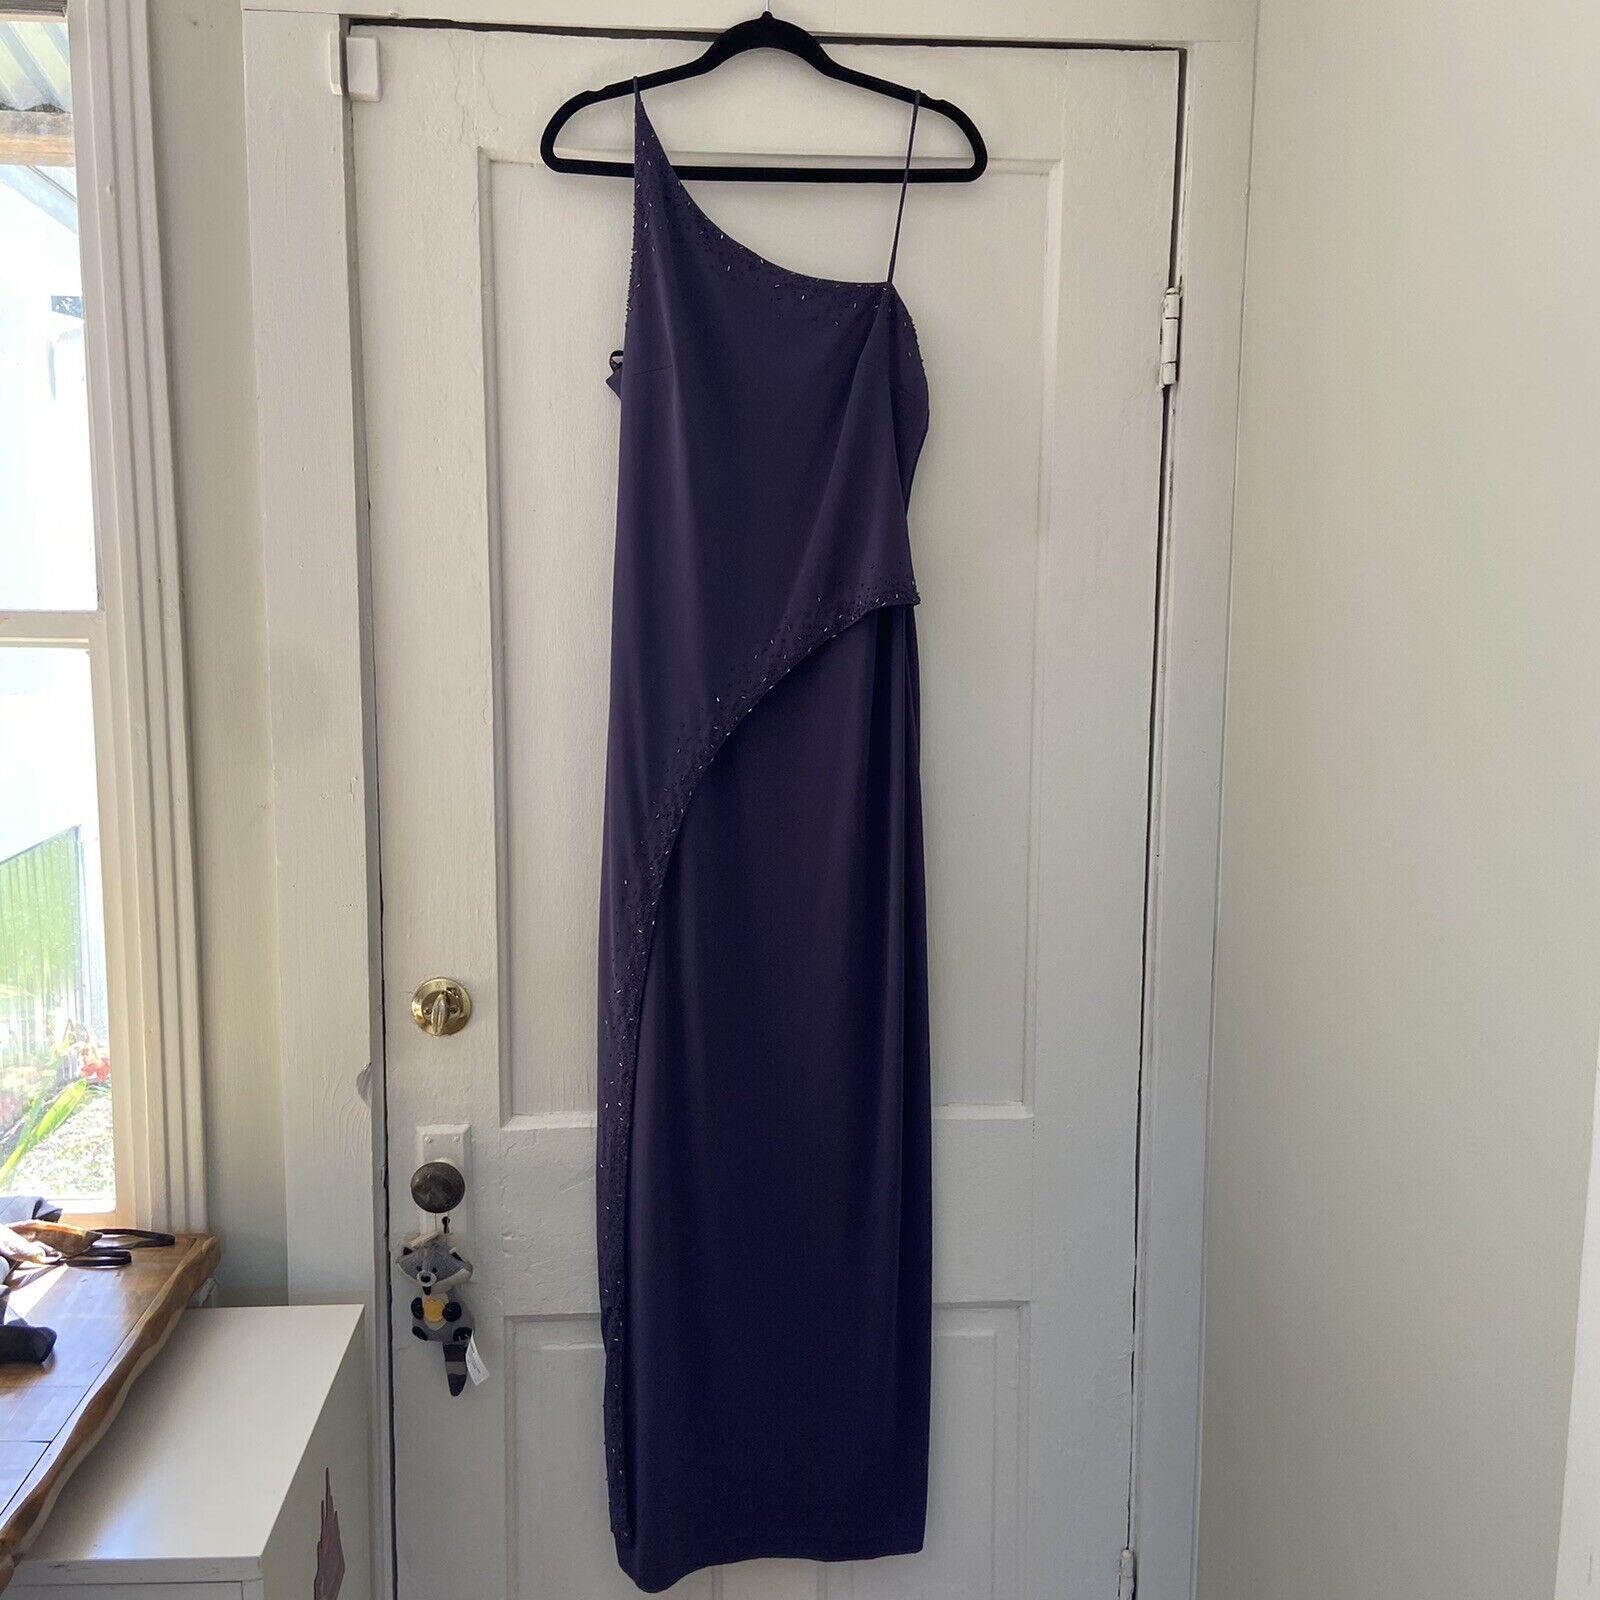 Niki by Niki Livas Purple Beaded Evening Gown Dress-Size 12-EUC